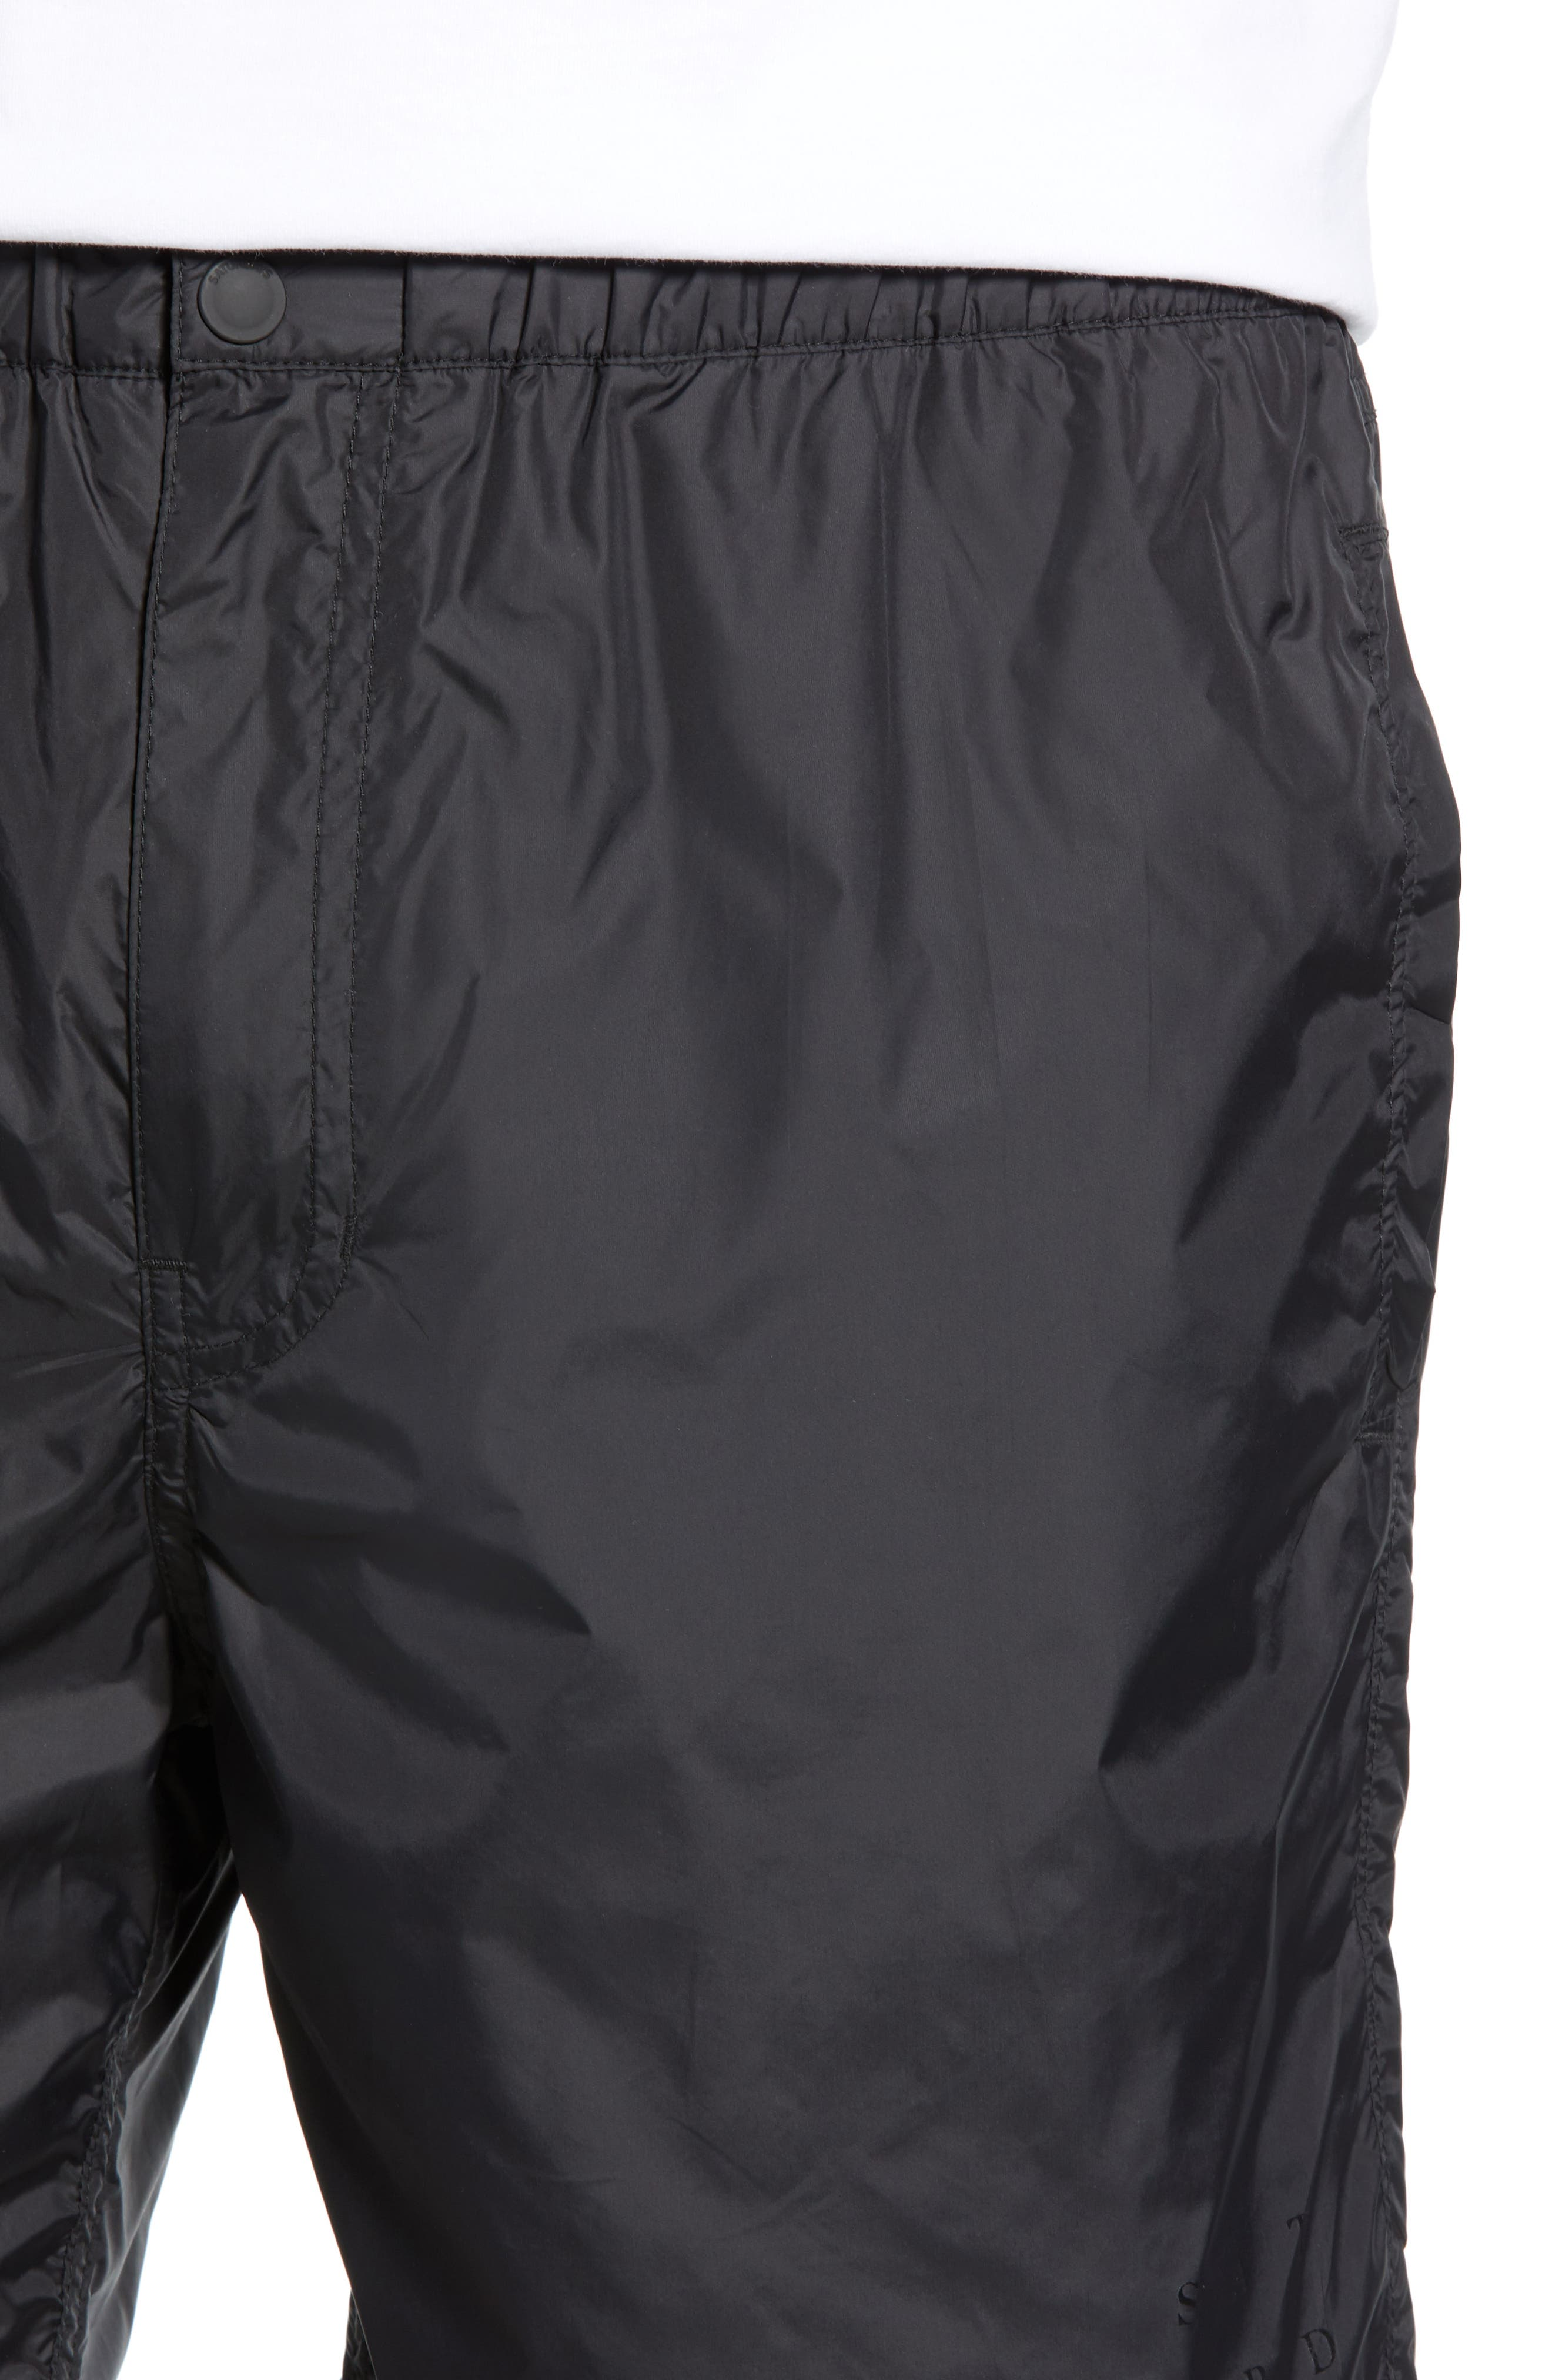 SATURDAYS NYC, Trent Hybrid Athletic Shorts, Alternate thumbnail 4, color, BLACK